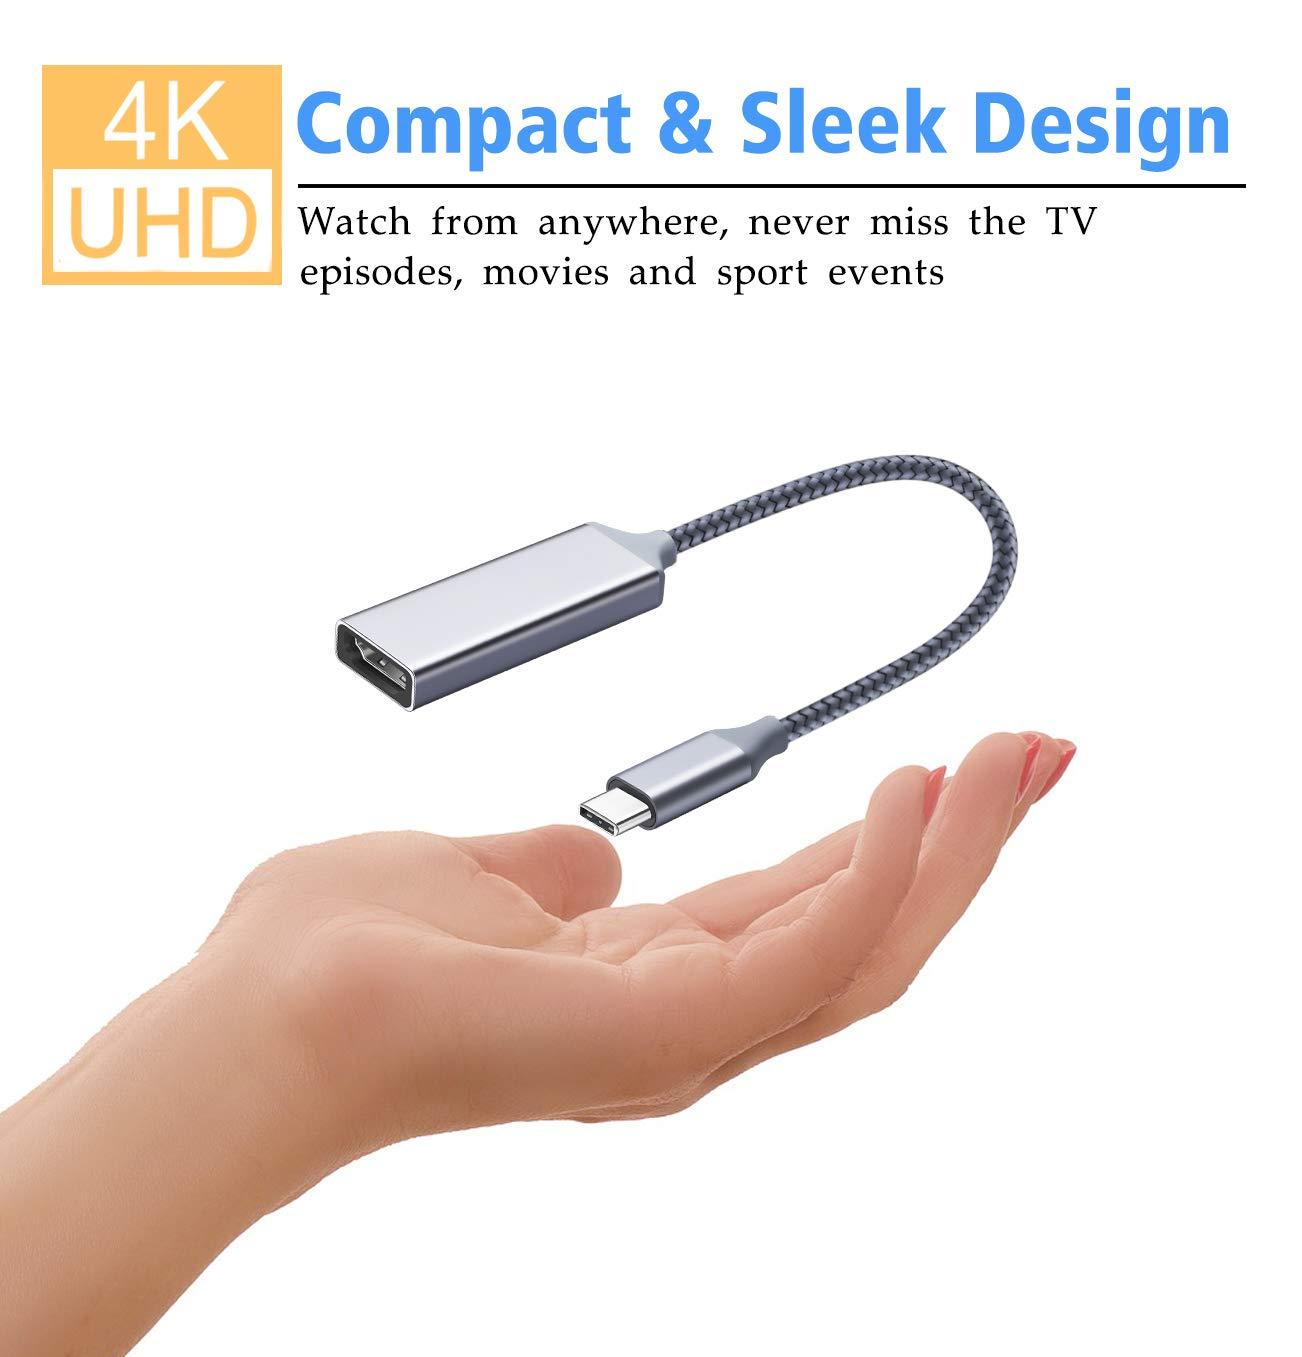 Highwings USB C to HDMI Adapter (4K@60Hz), Type C to HDMI Adapter,Thunderbolt 3 Compatible,Compatible Samsung Galaxy Note 9/S8/S9 Plus/Note8,Surfacebook 2, Pixelbook,2017 MacBook, 2017 iMac,Grey by Highwings (Image #3)